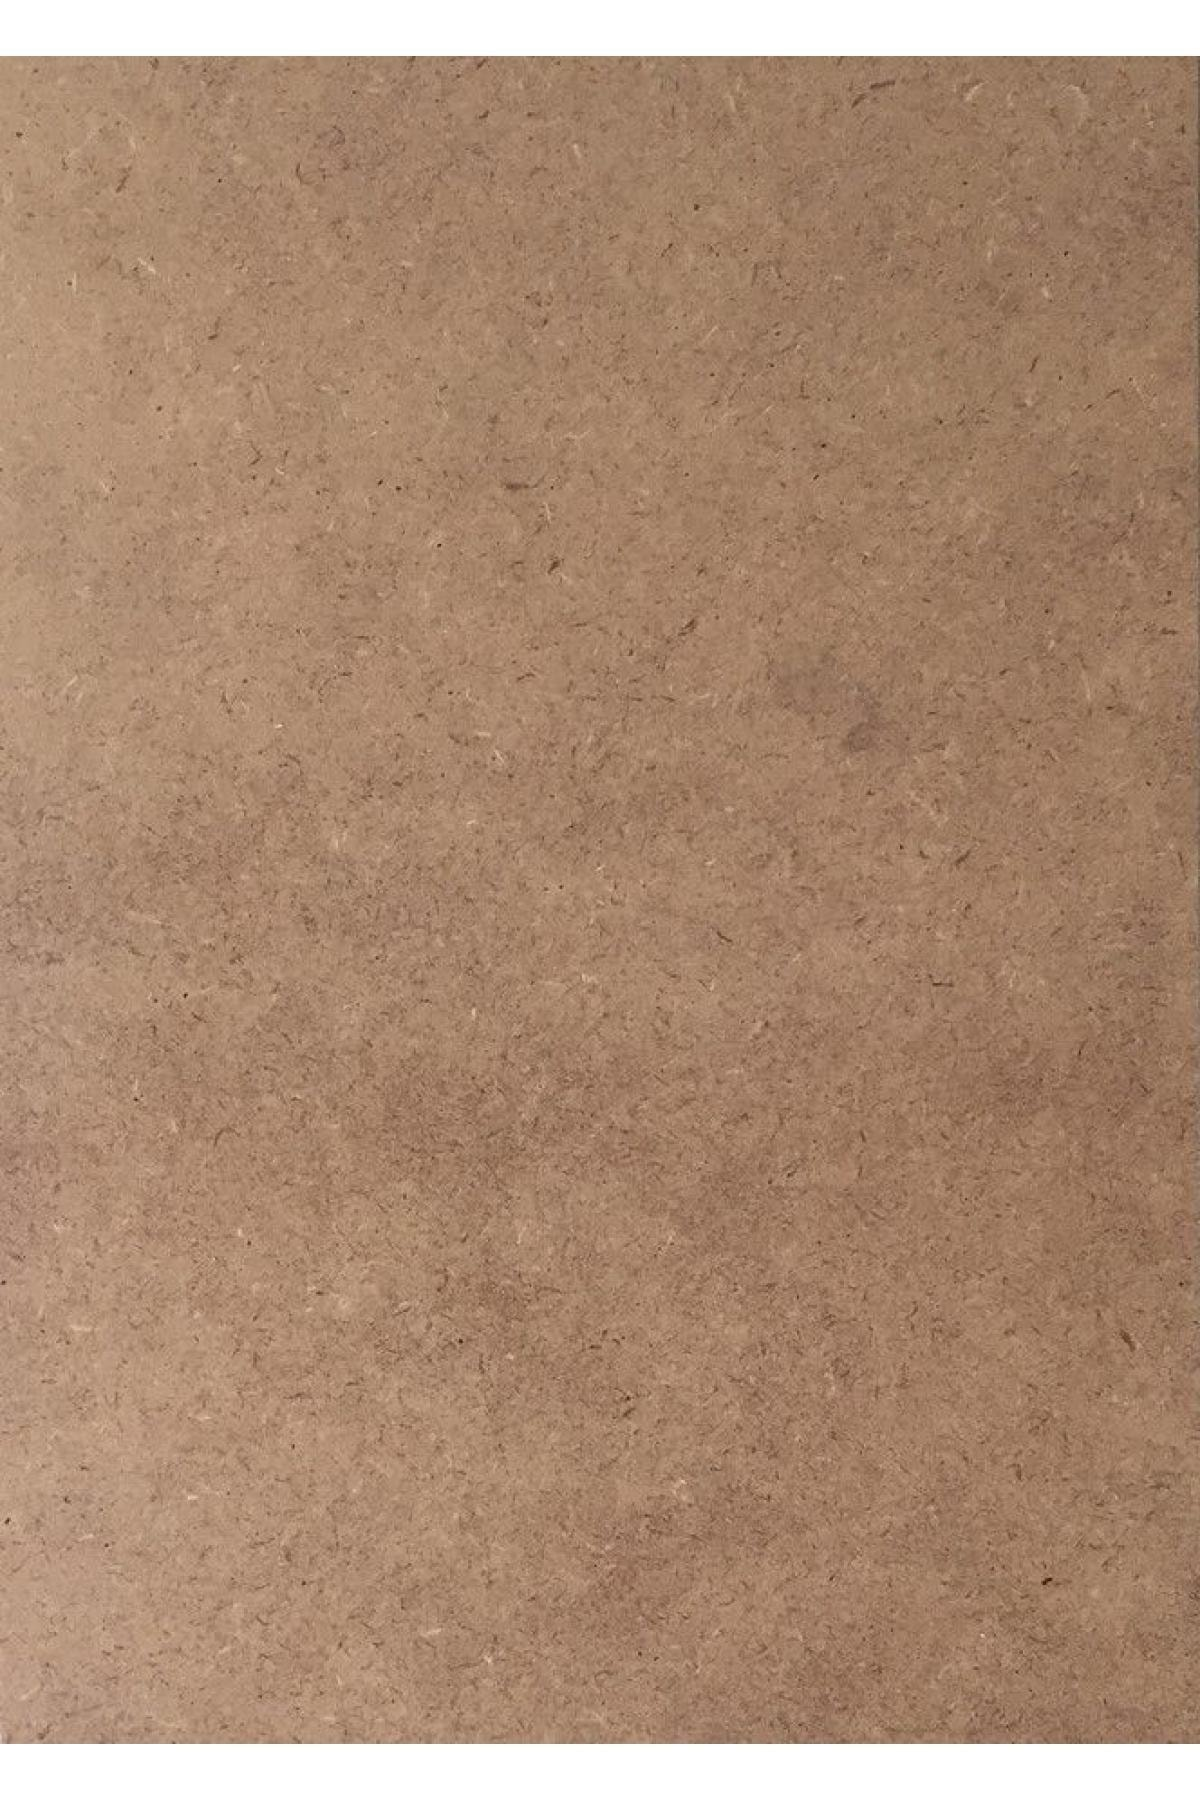 mobilreyon - Duralit Ham Mdf 4 Mm 35x50 Cm Resim Kağıdı Ölçüsü (2 Adet) 1